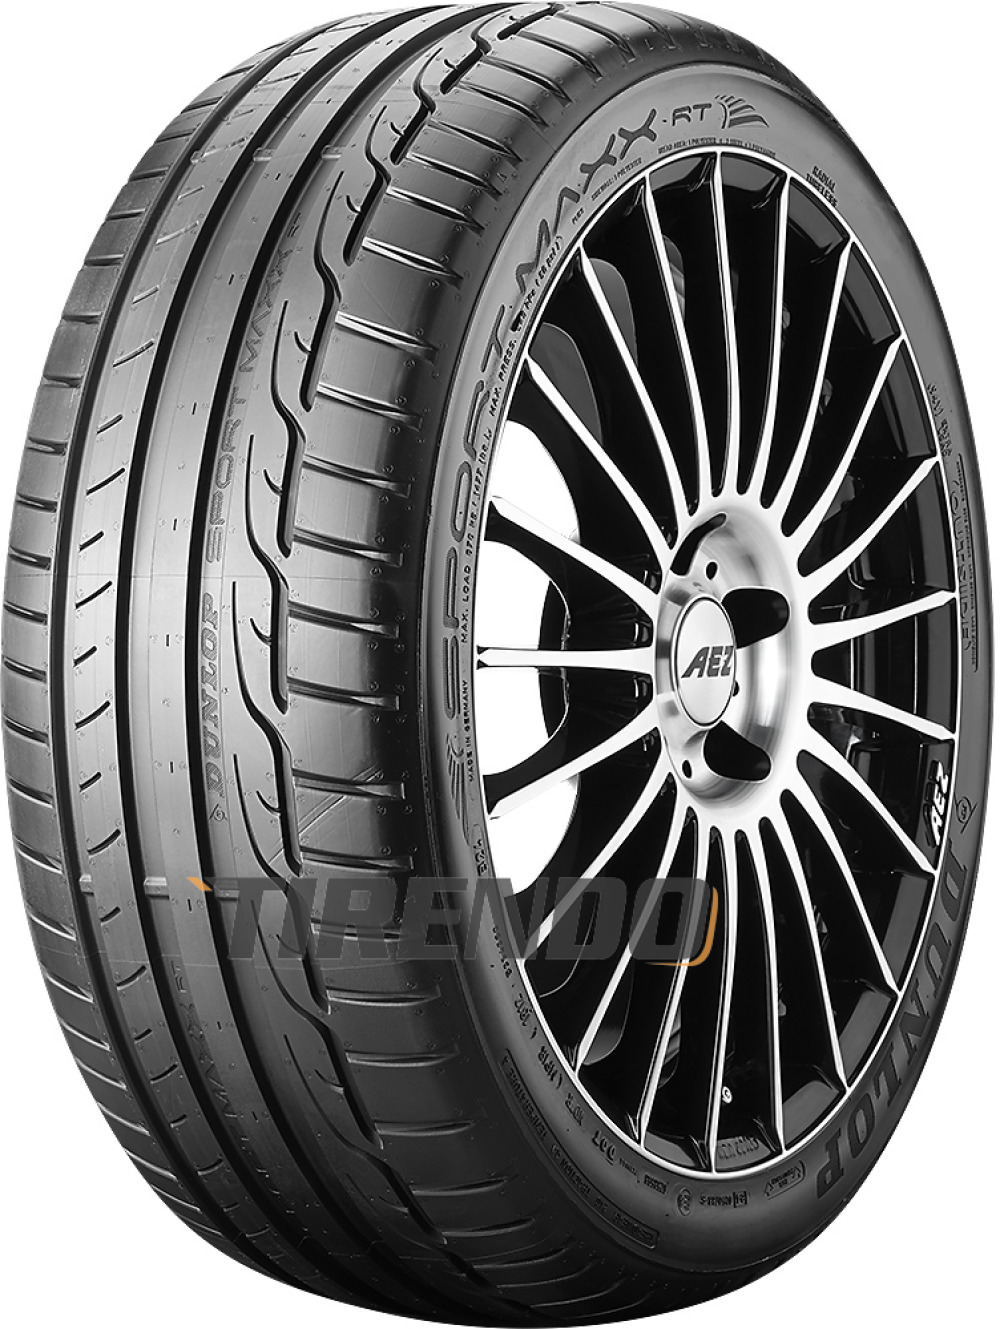 Dunlop Sport Maxx RT ( 225/45 R17 94W XL mit Felgenschutz (MFS) )